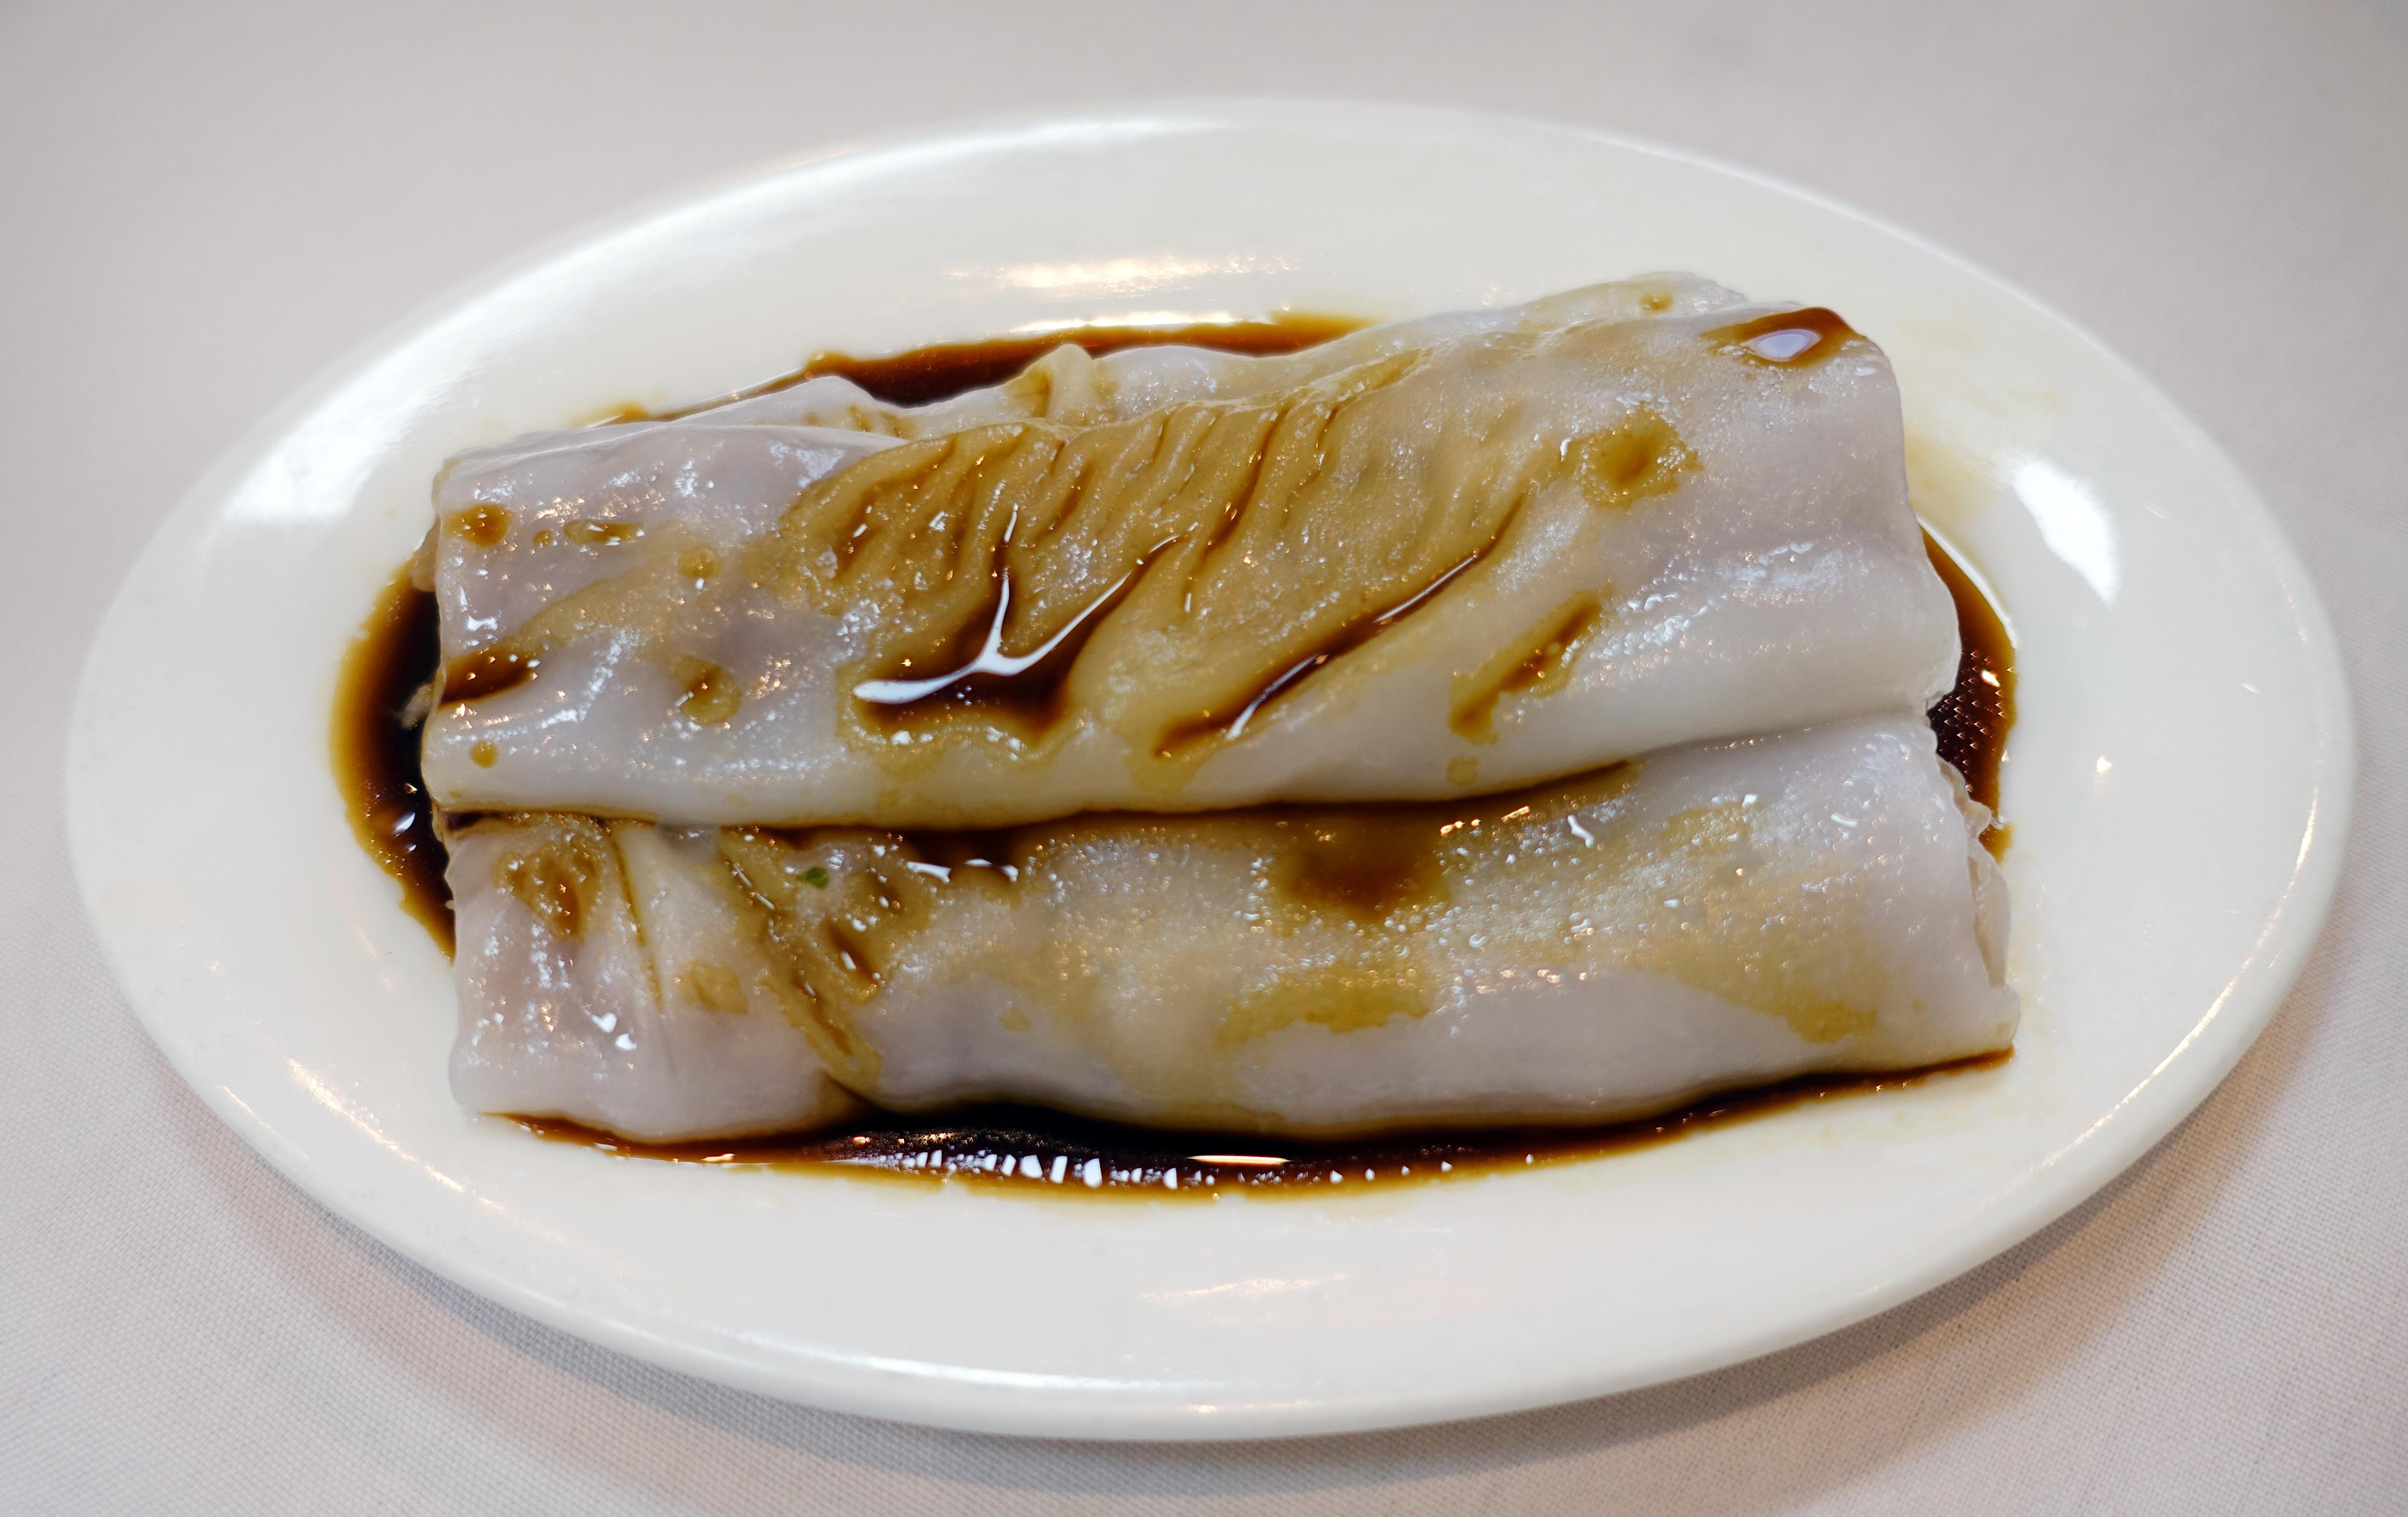 牛肉腸粉 Beef rice rolls